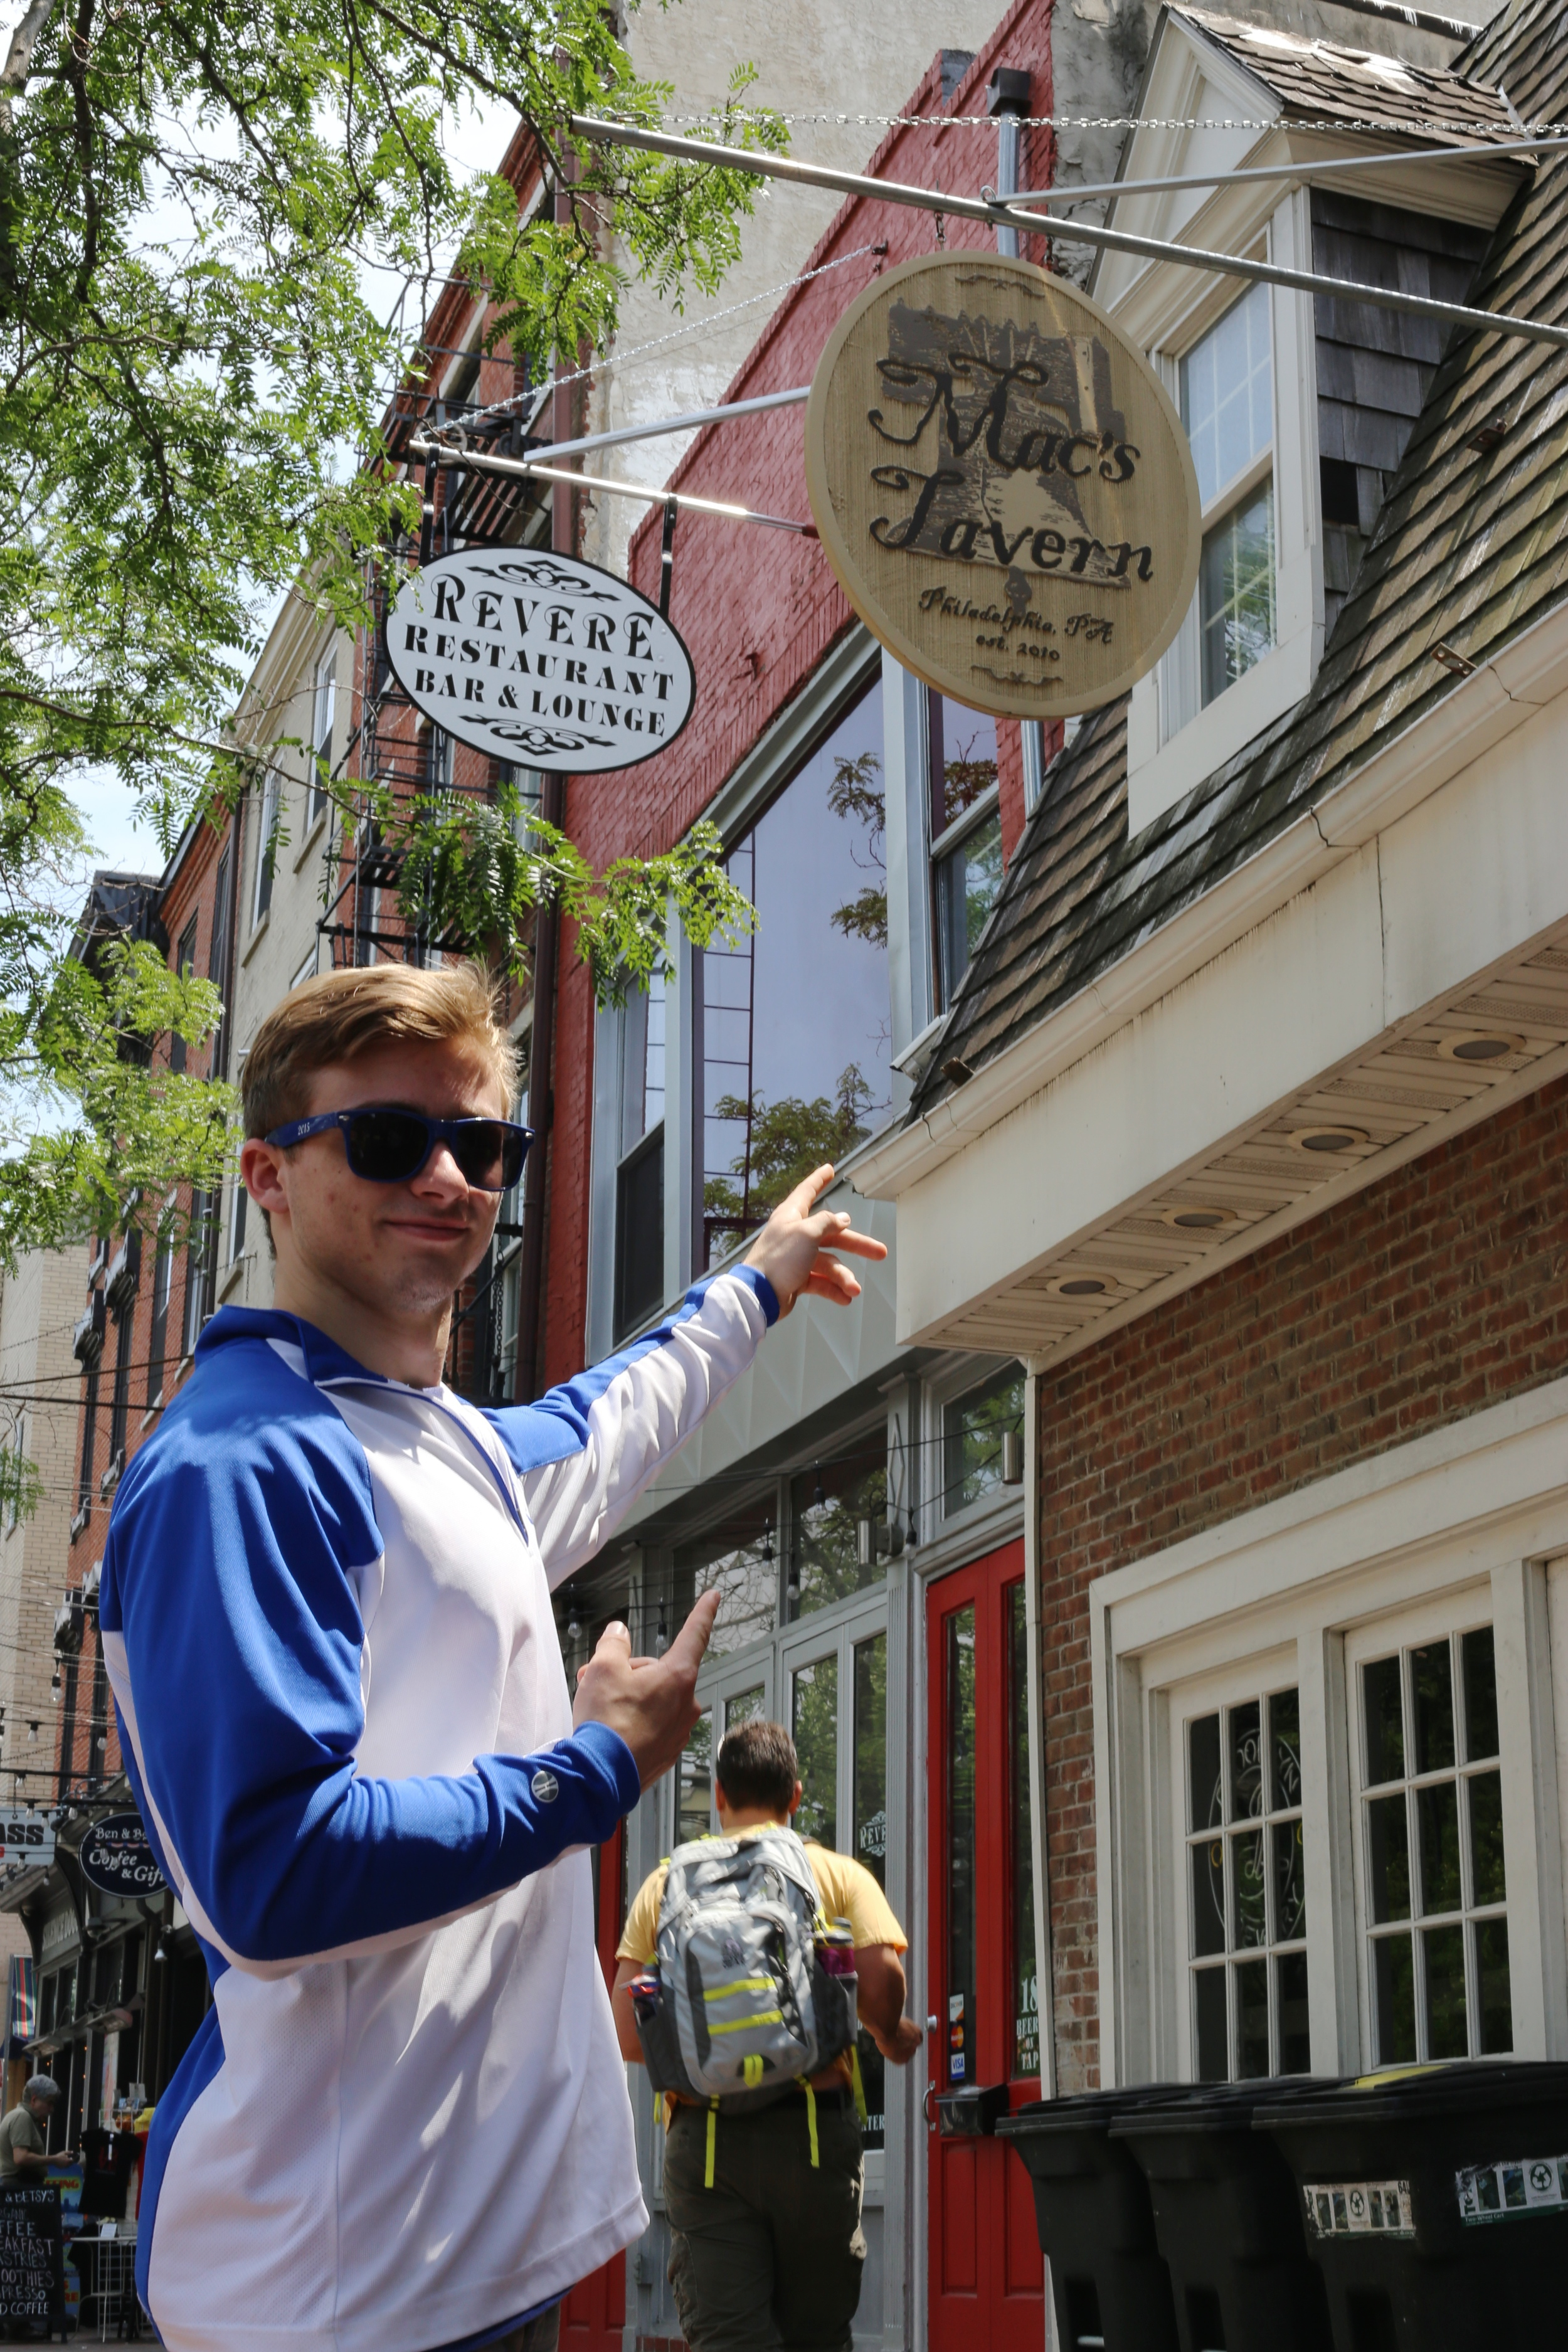 Mac's Tavern (from It's Always Sunny In Philadelphia)